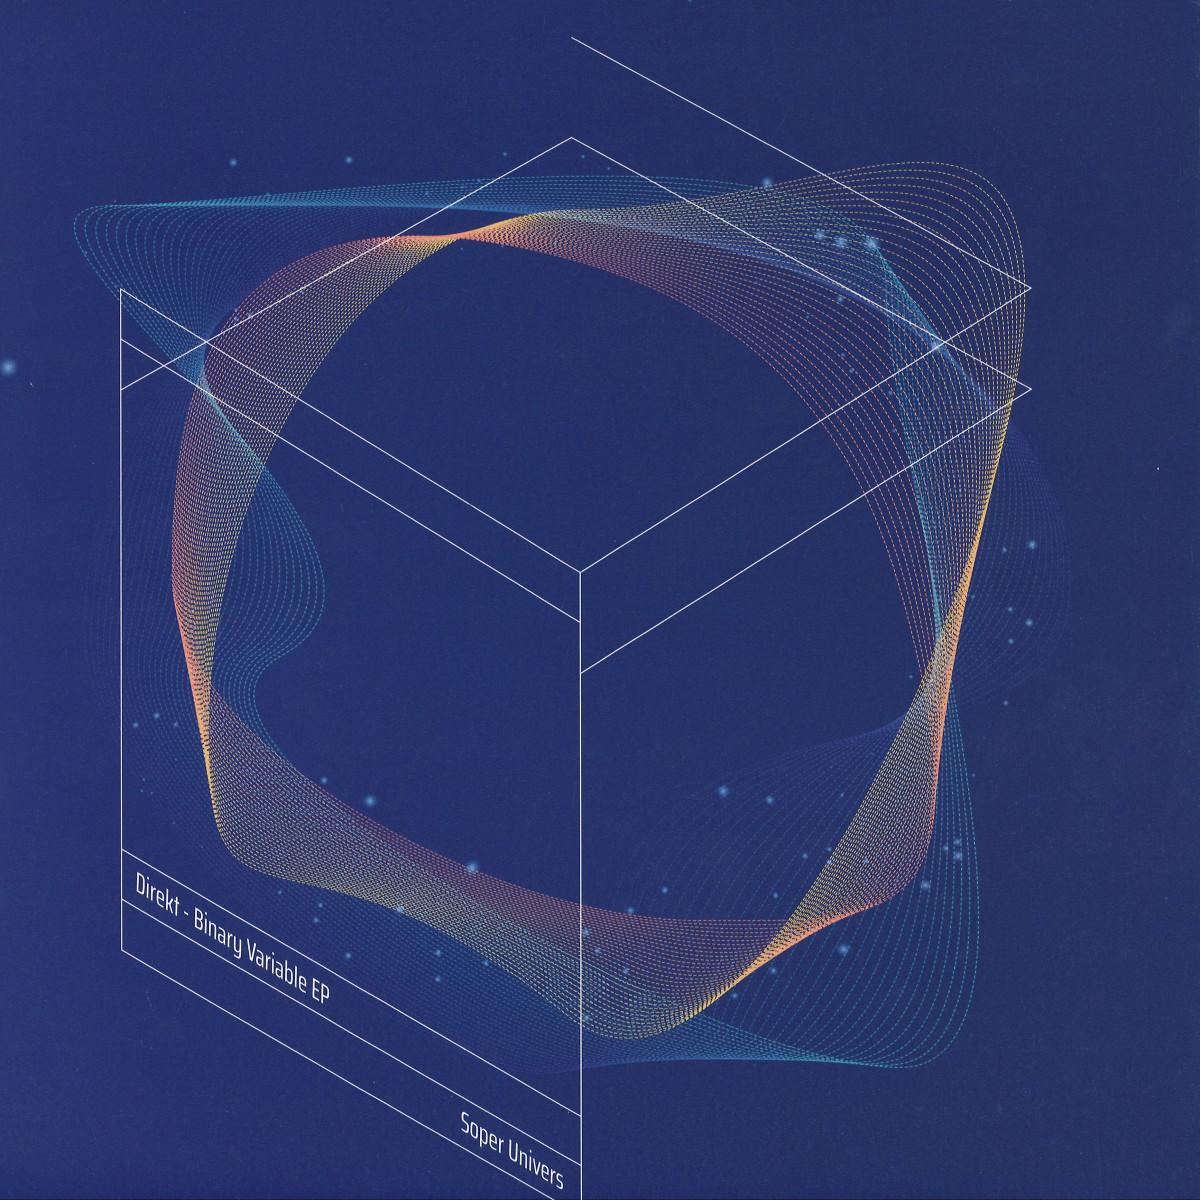 Direkt - Binary Variable EP [Soper Univers] 01